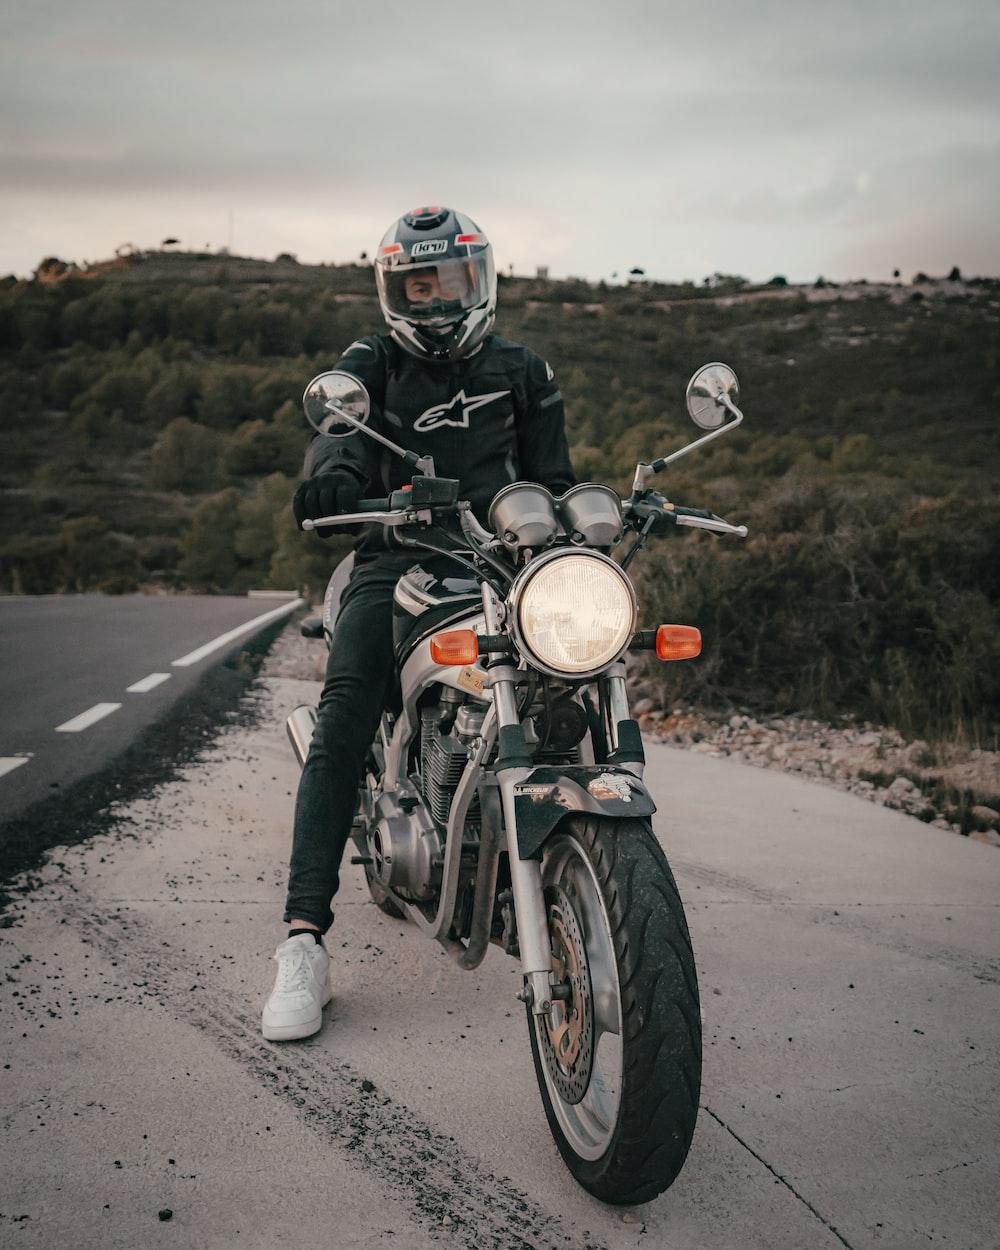 man wearing black and white Alpinestar jacket riding motorcycle near road